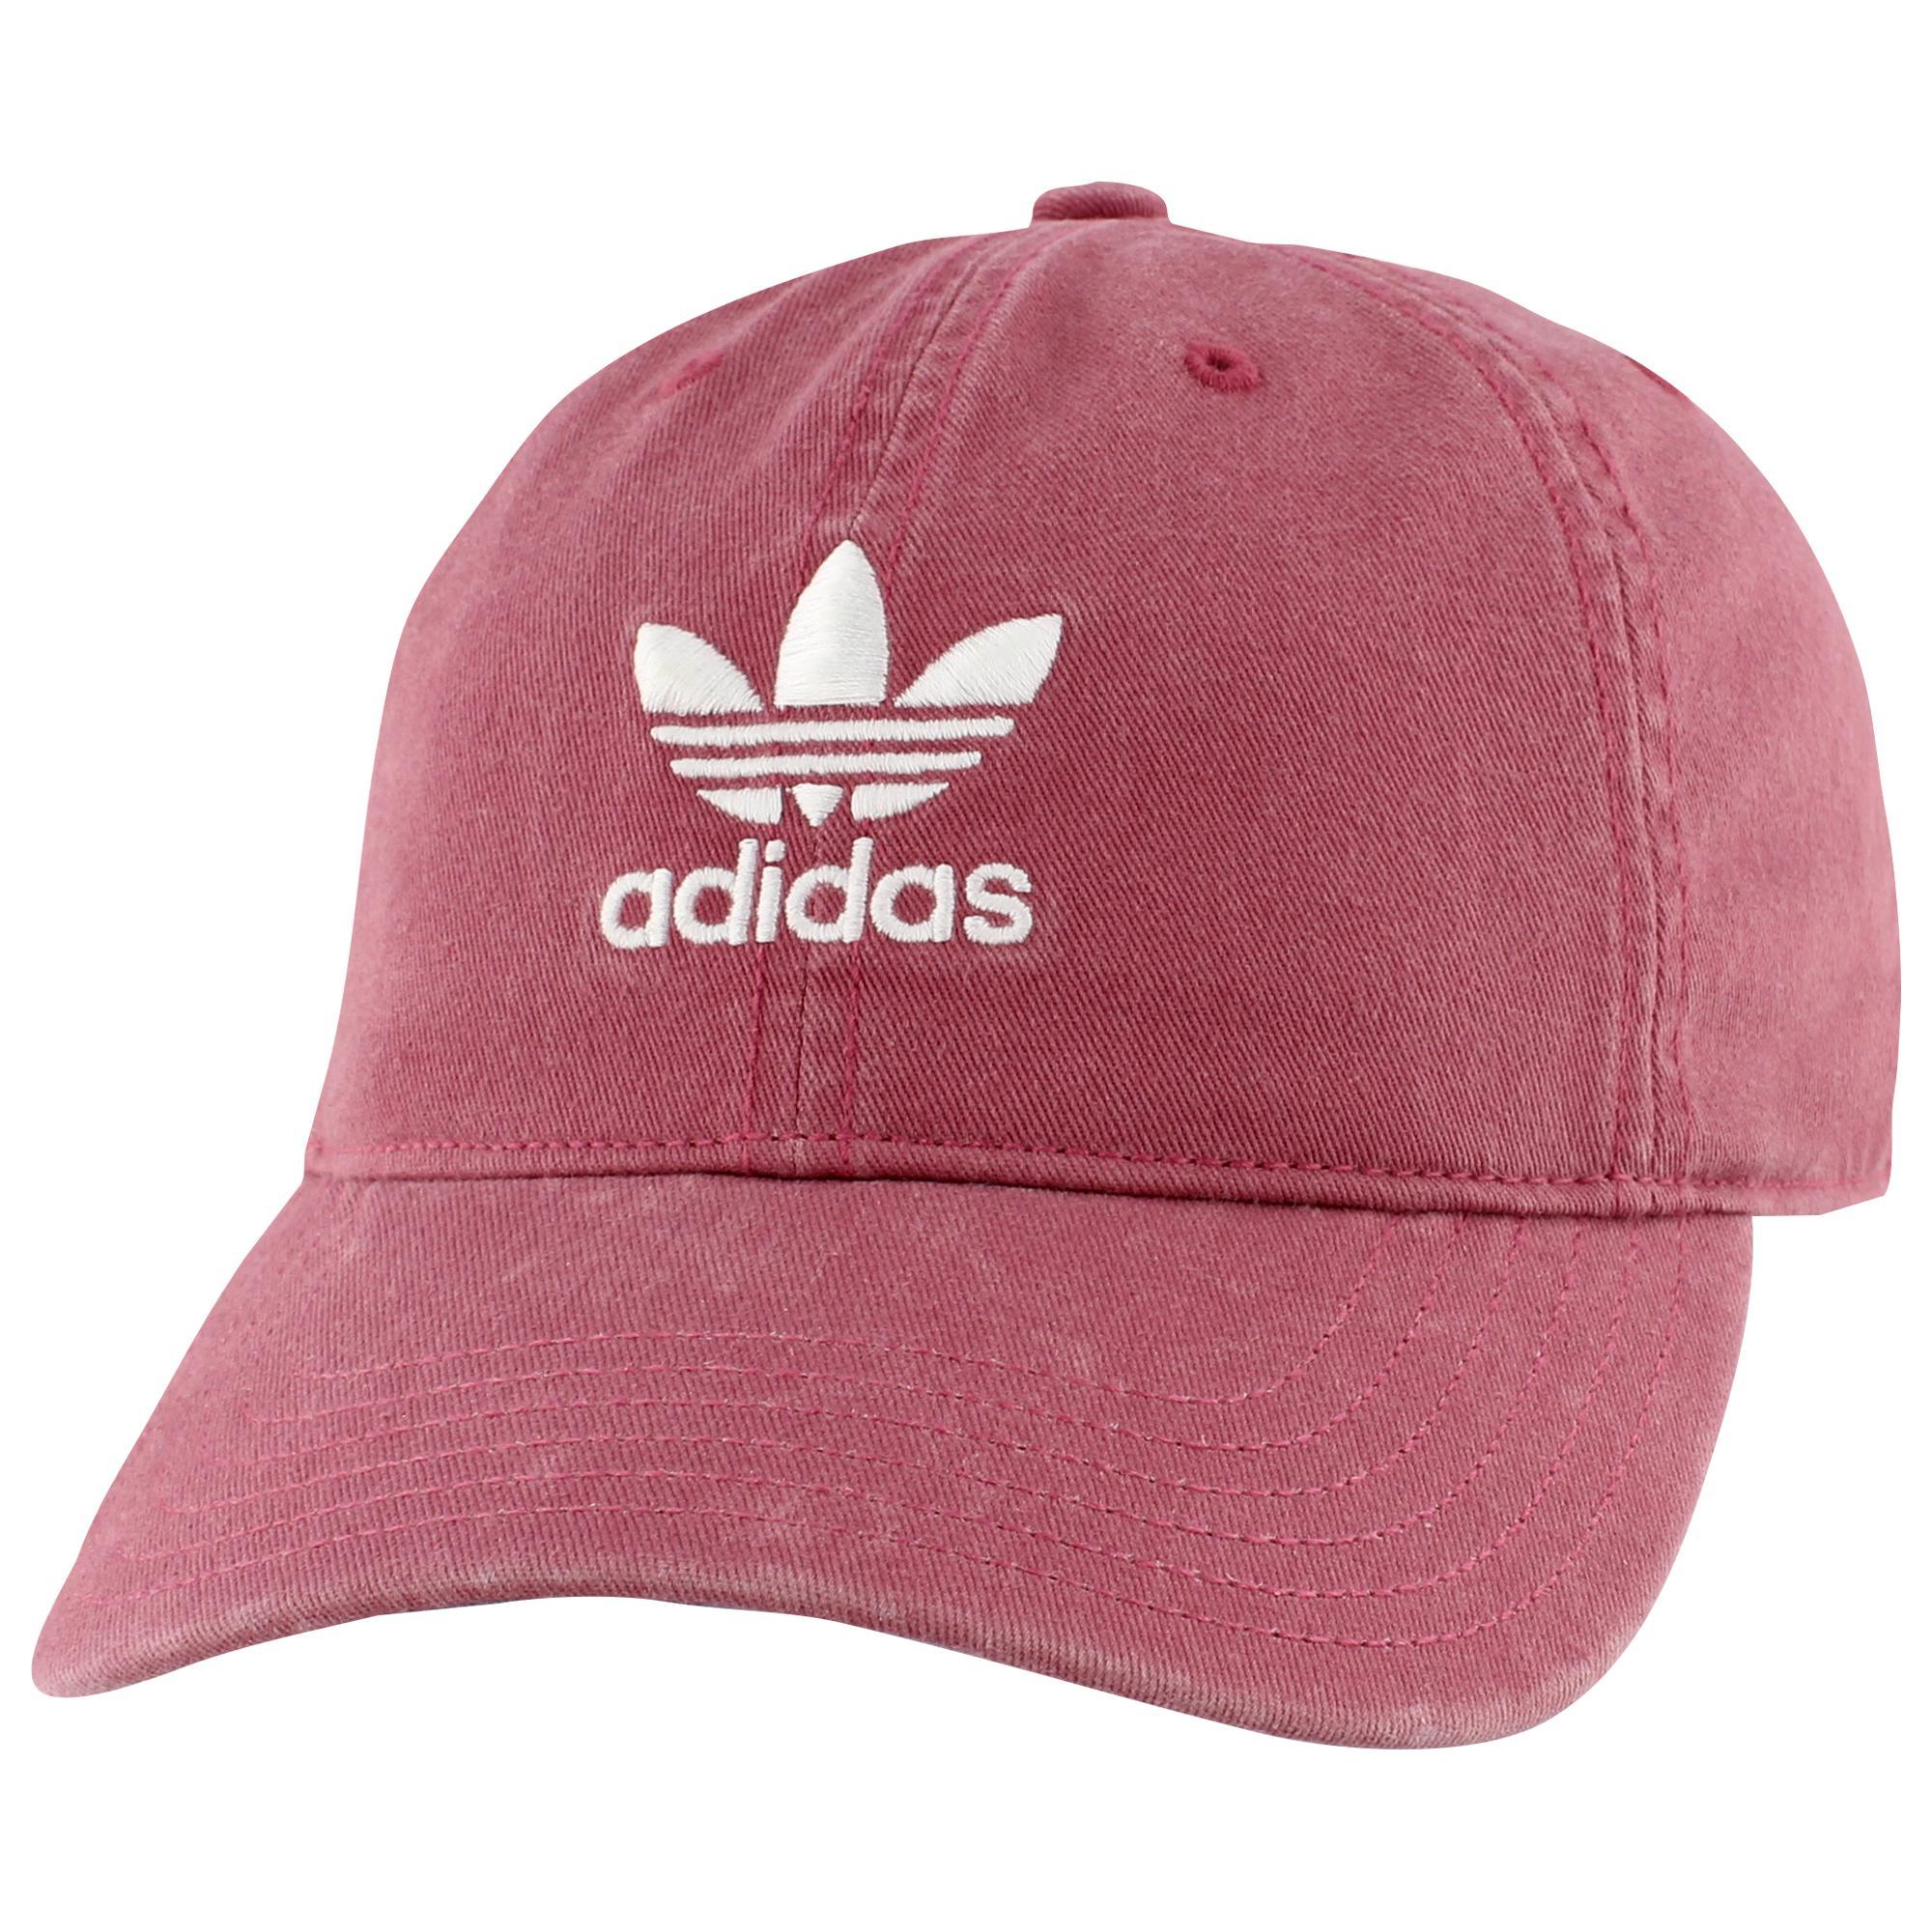 ecd440805ac Lyst - Adidas Originals Relaxed Strapback Hat for Men